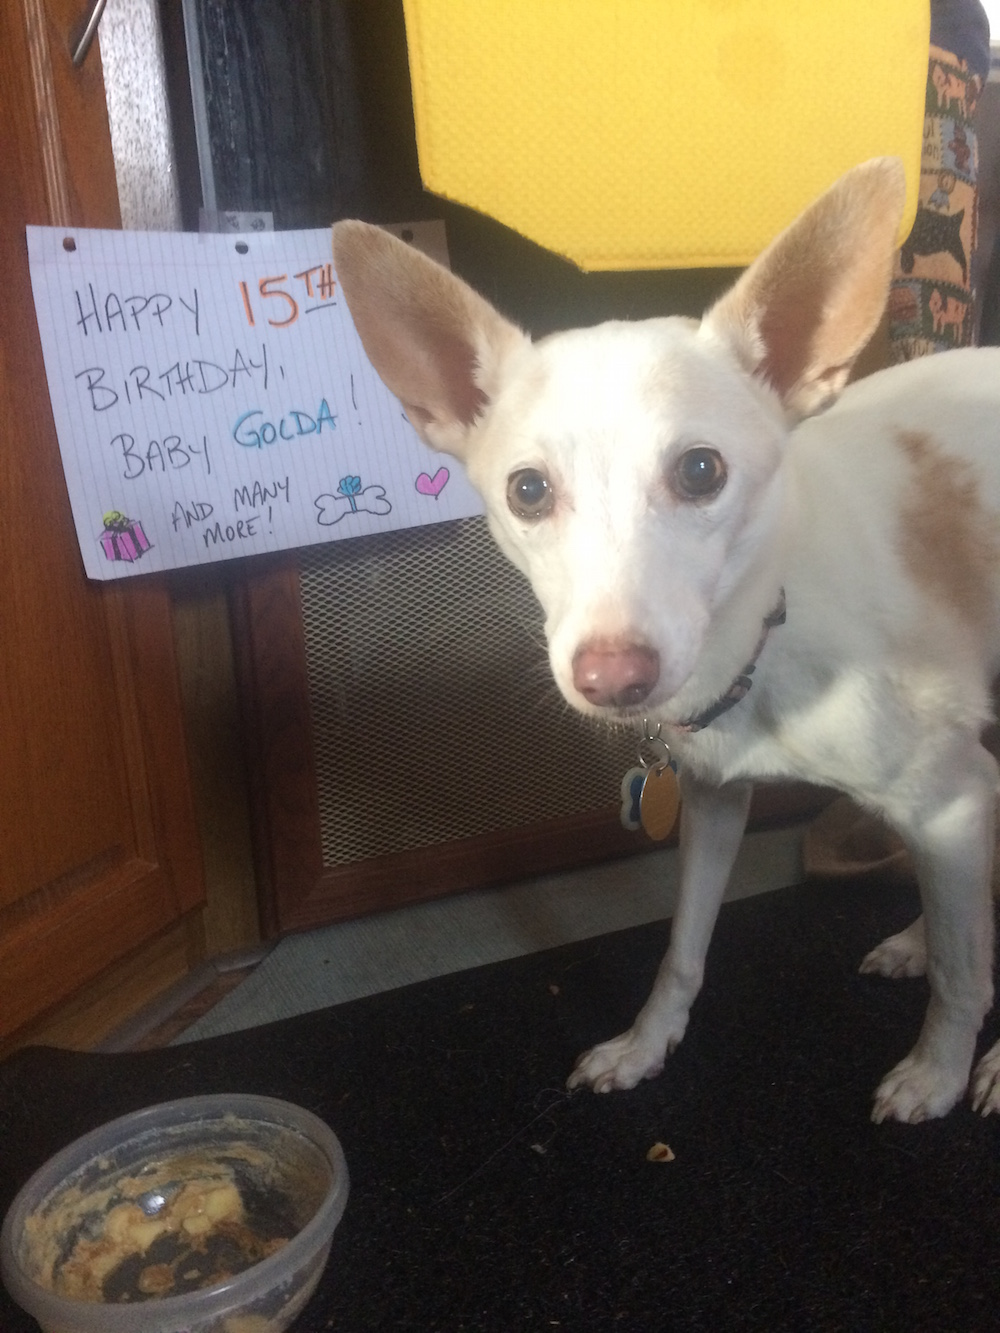 Golda on her 15th birthday on the Washington Coast.